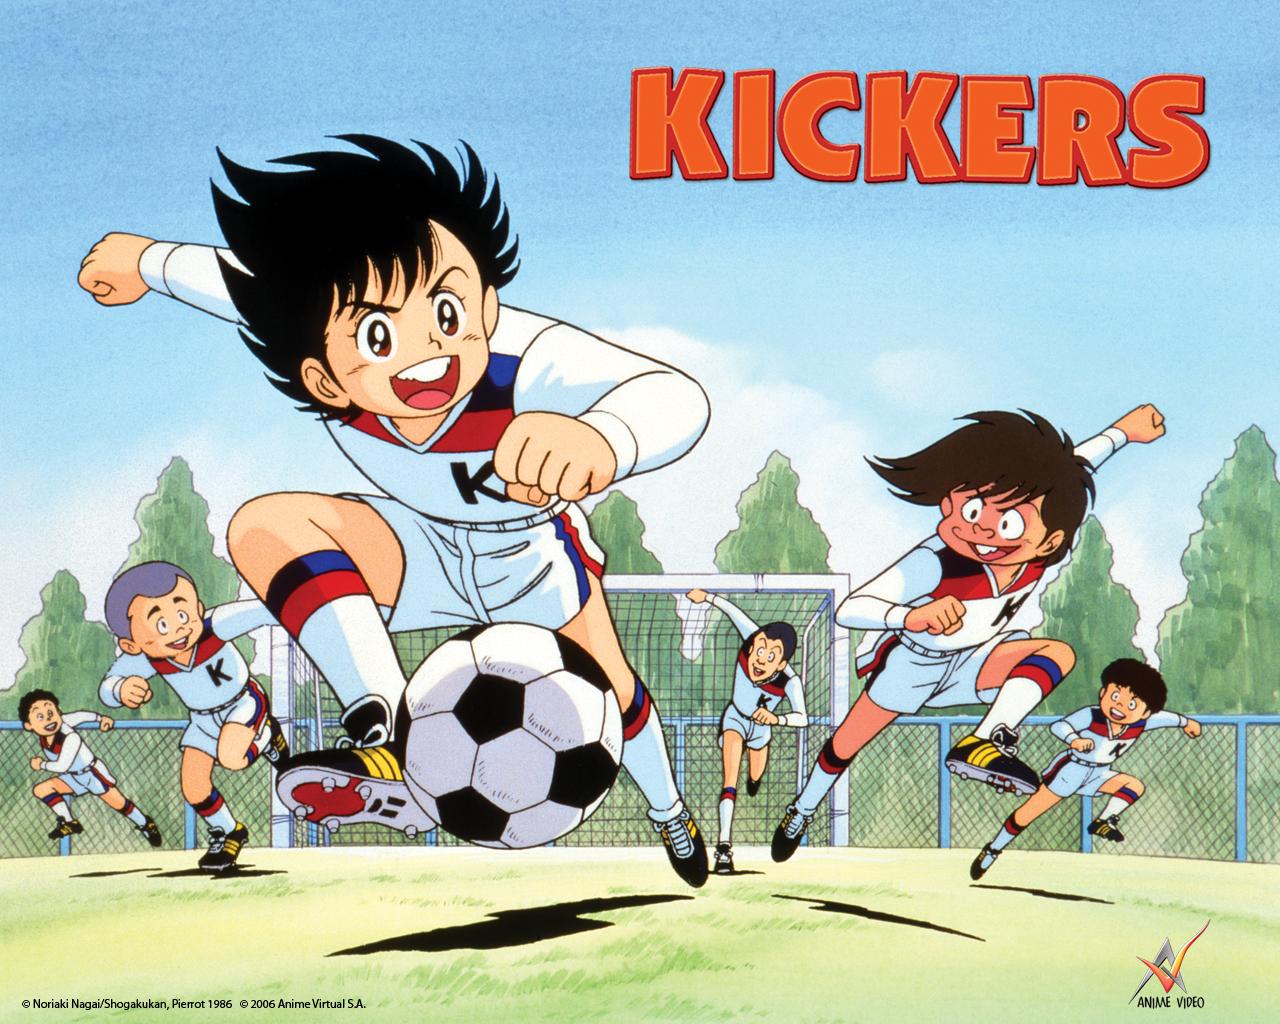 Kickers Wallpaper(1)